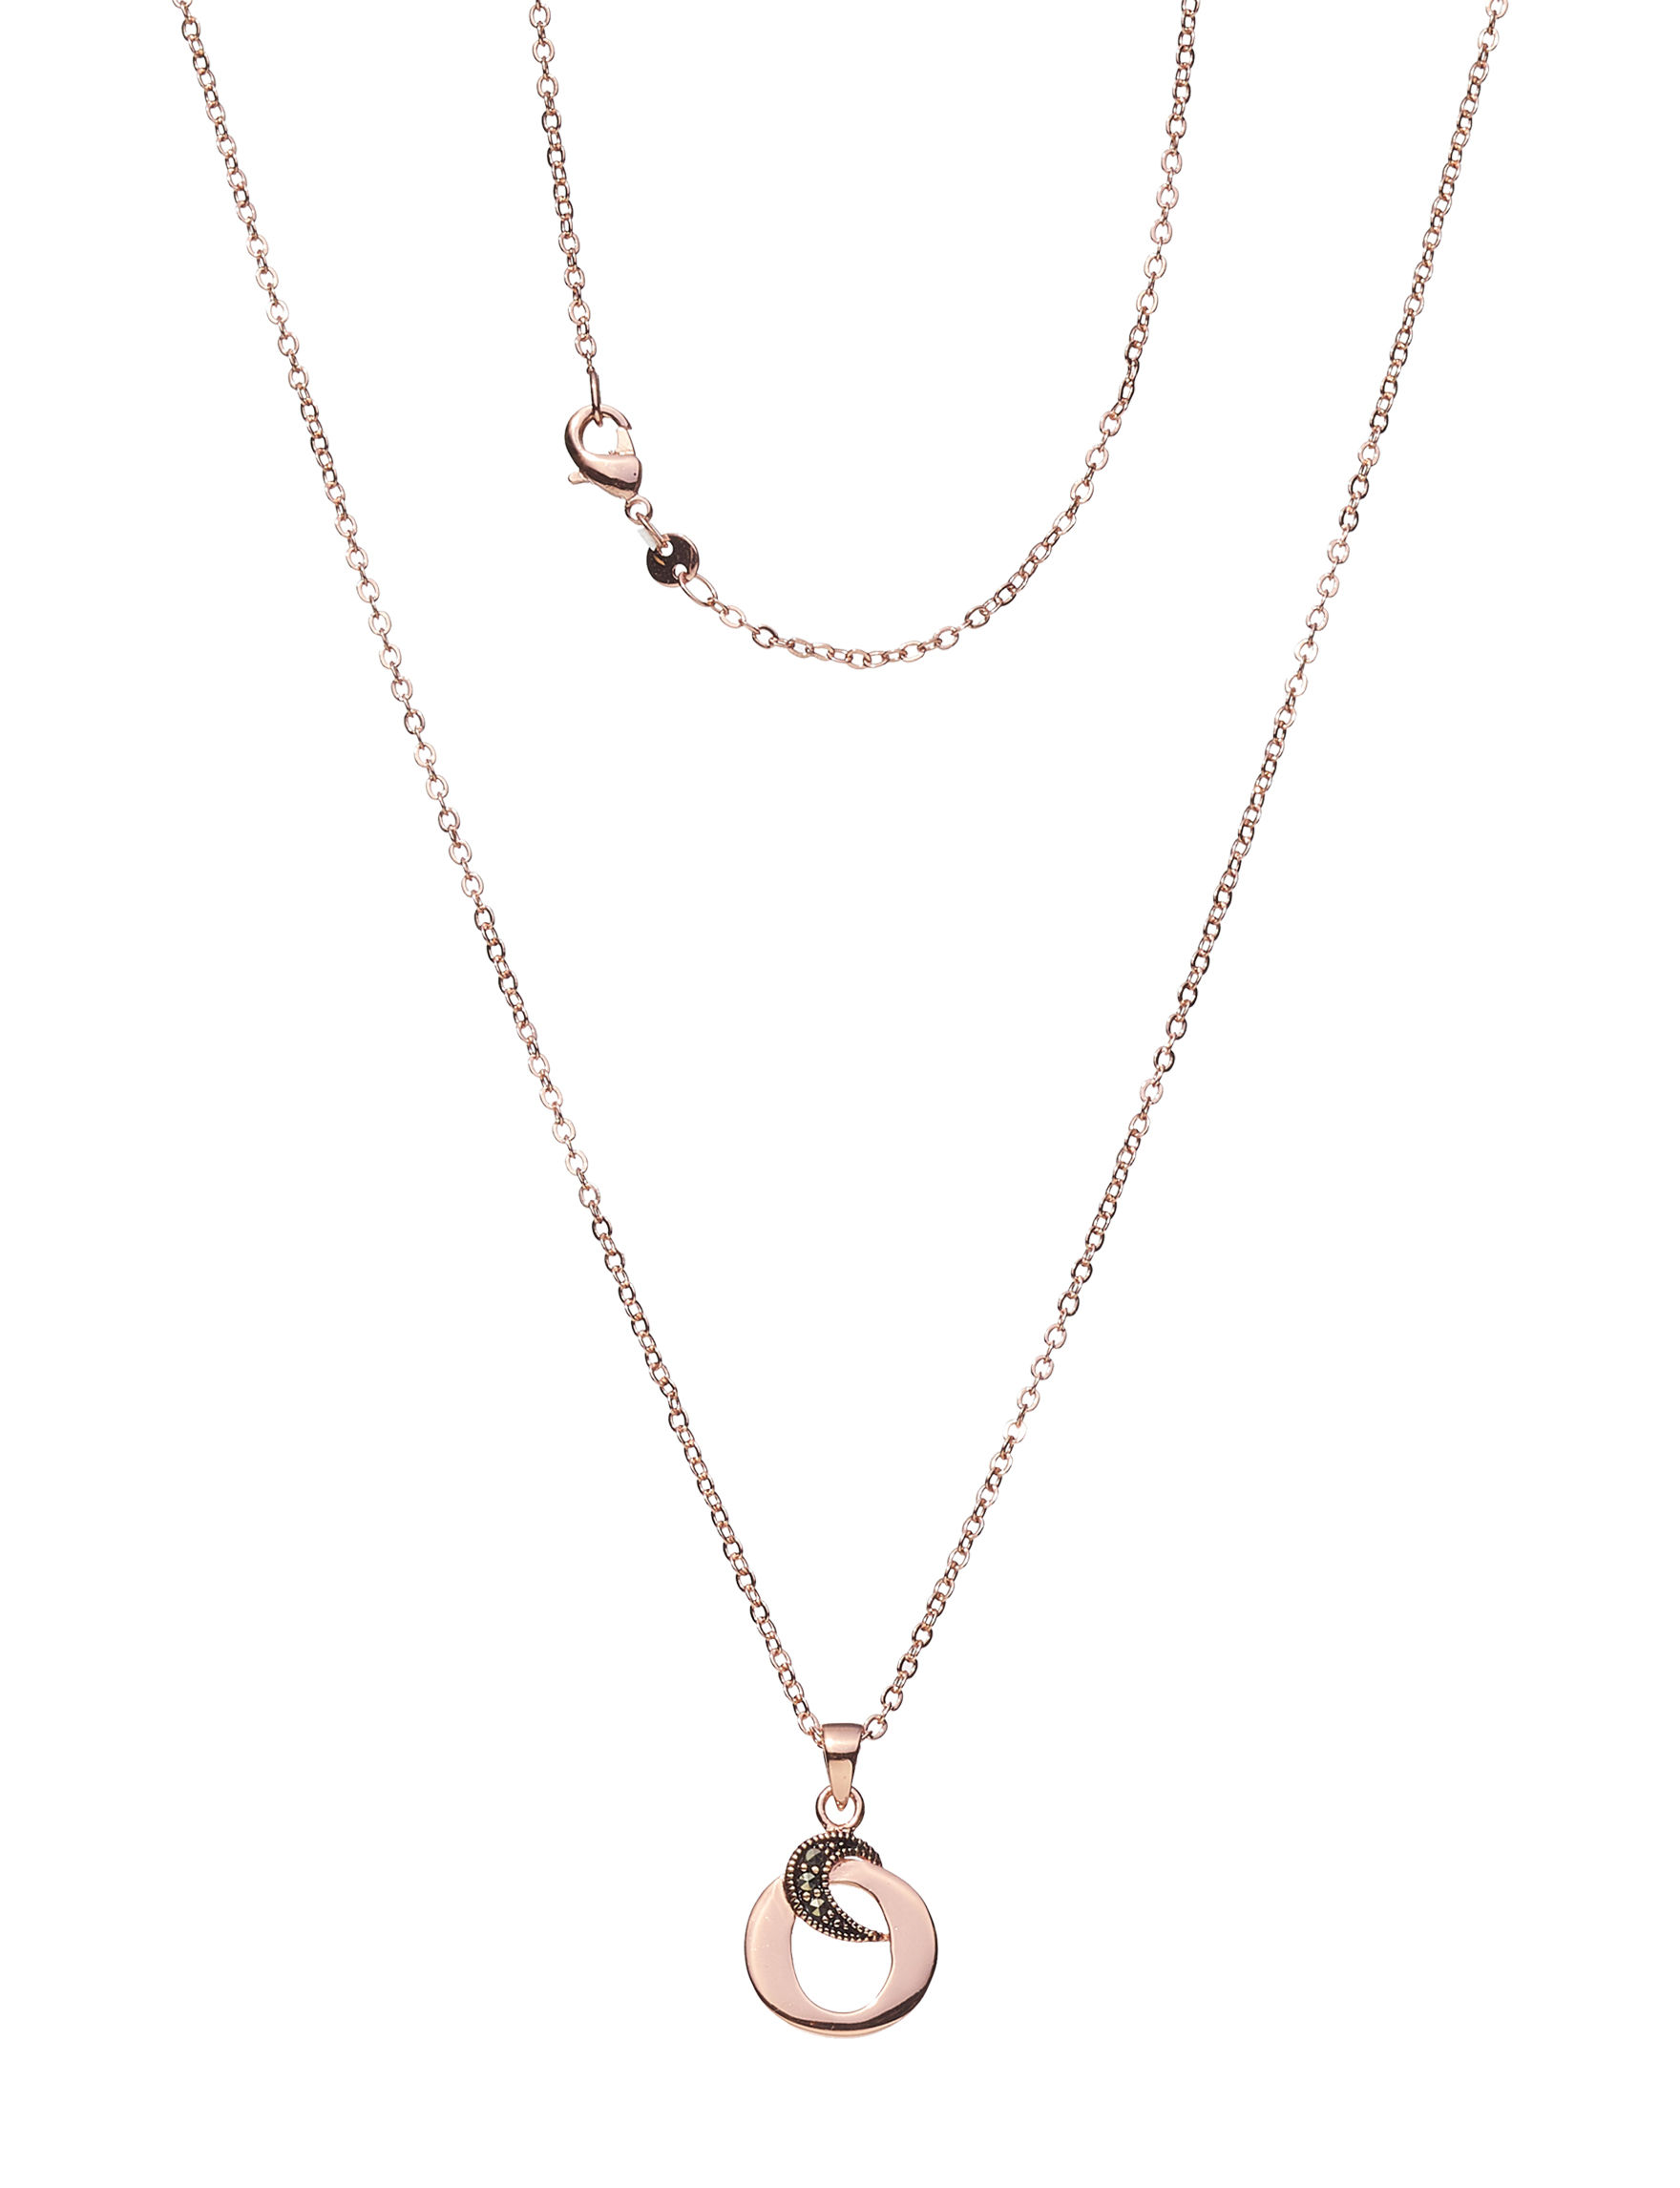 Marsala Rose Gold Necklaces & Pendants Fine Jewelry